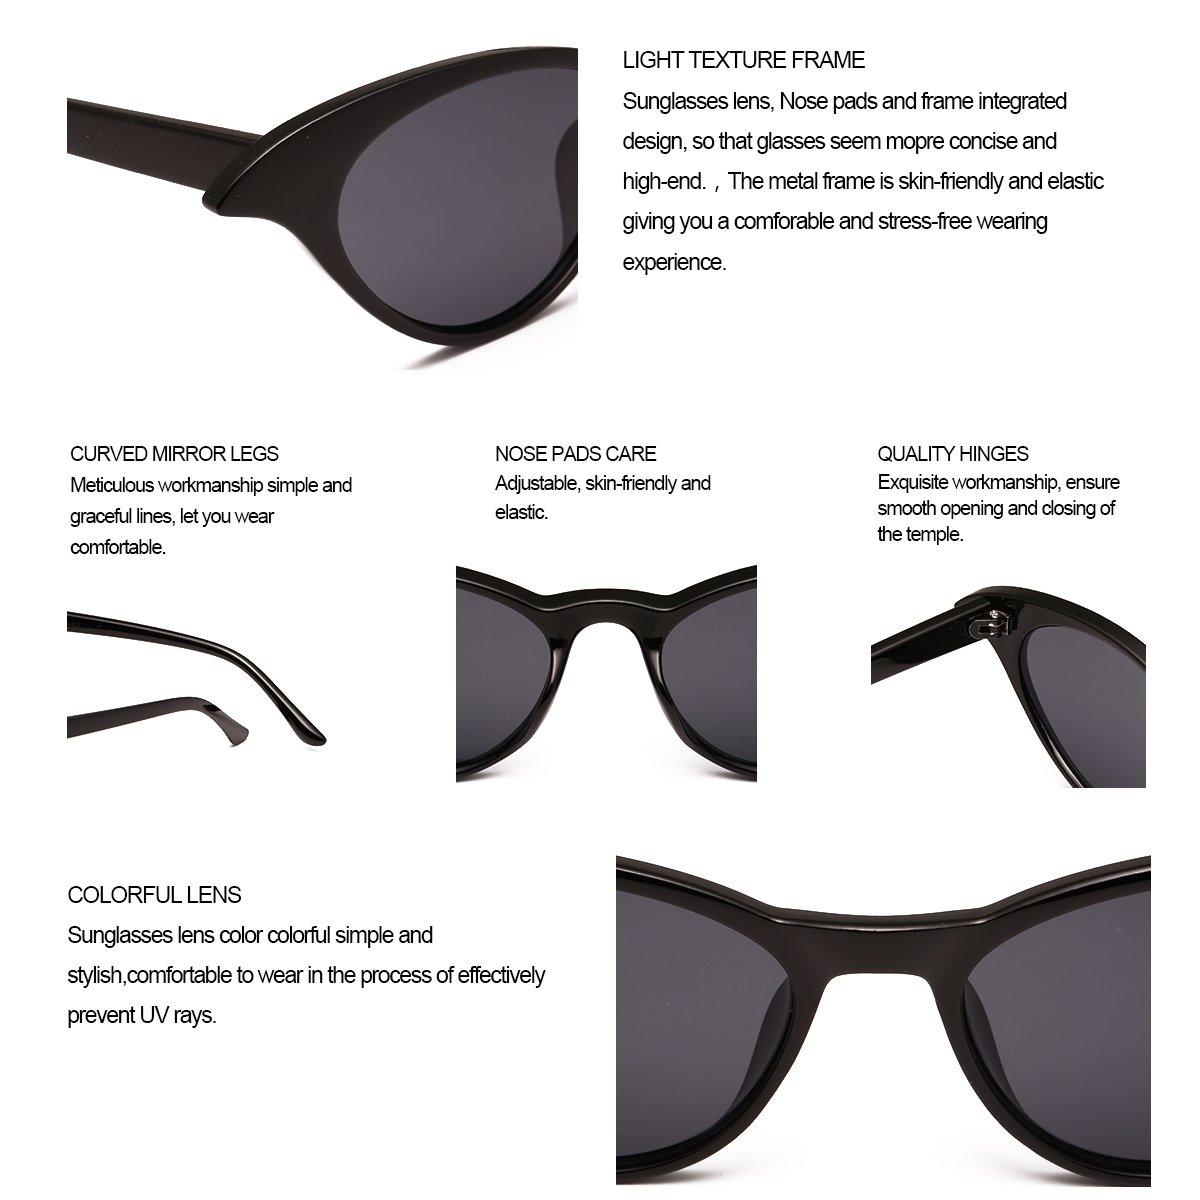 416f629e4c Amazon.com  Sunglasses for Women RAYSUN Vintage Retro Tinted Lens Cat Eye  Sunglasses Clout Goggles Mental Frame  Shoes